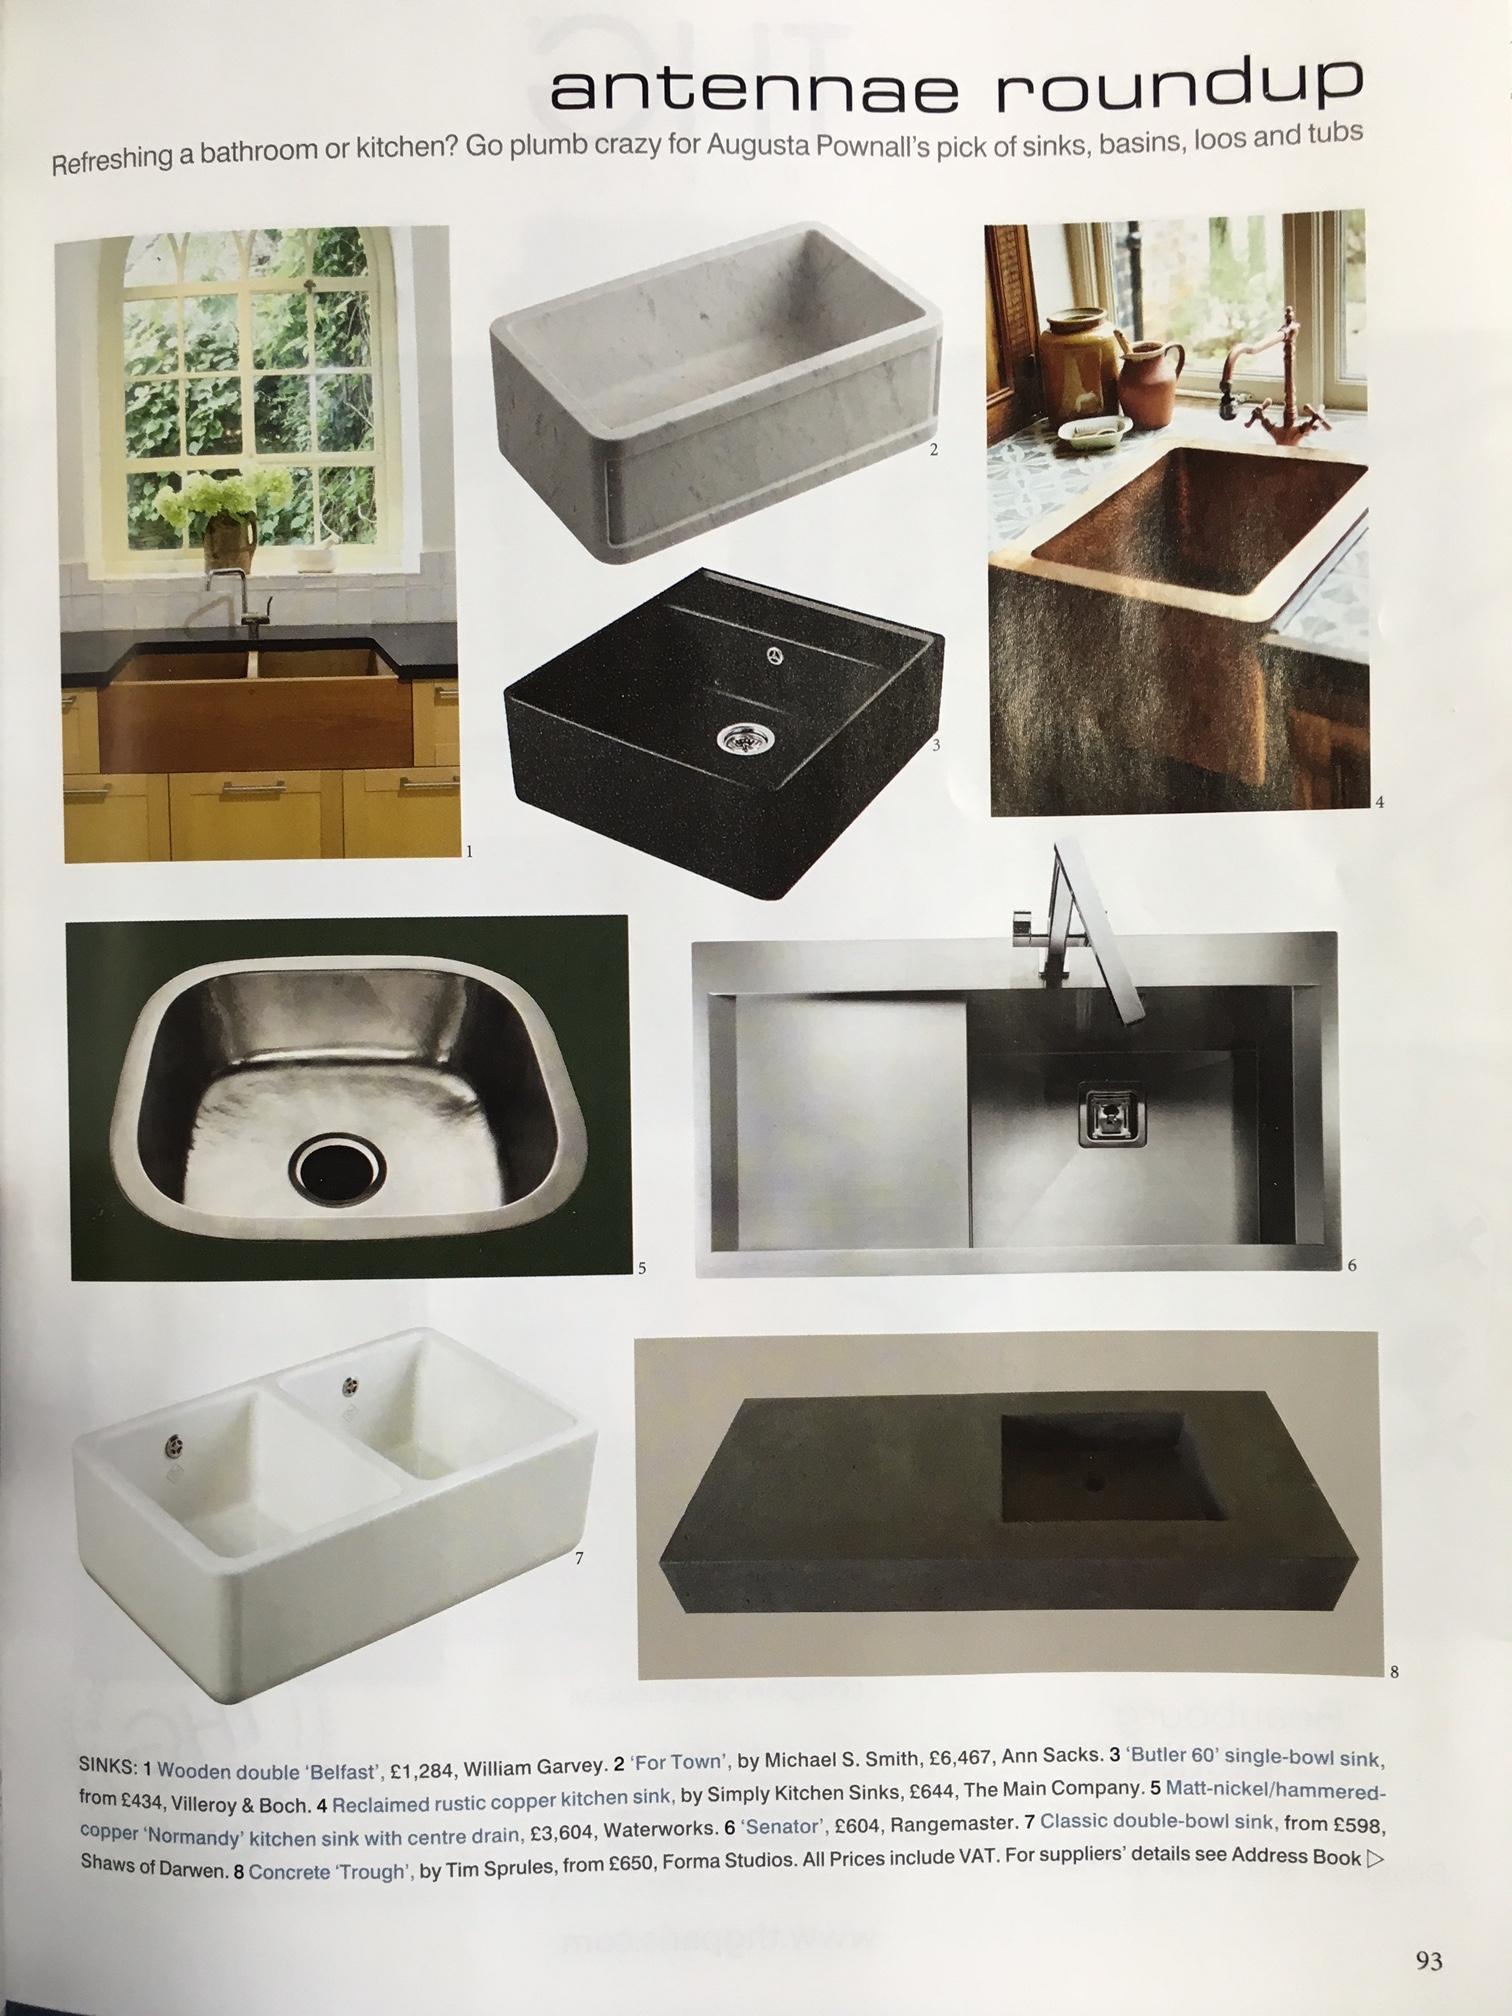 World of Interios Tim Sprules Forma Studios Concrete Sinks.JPG